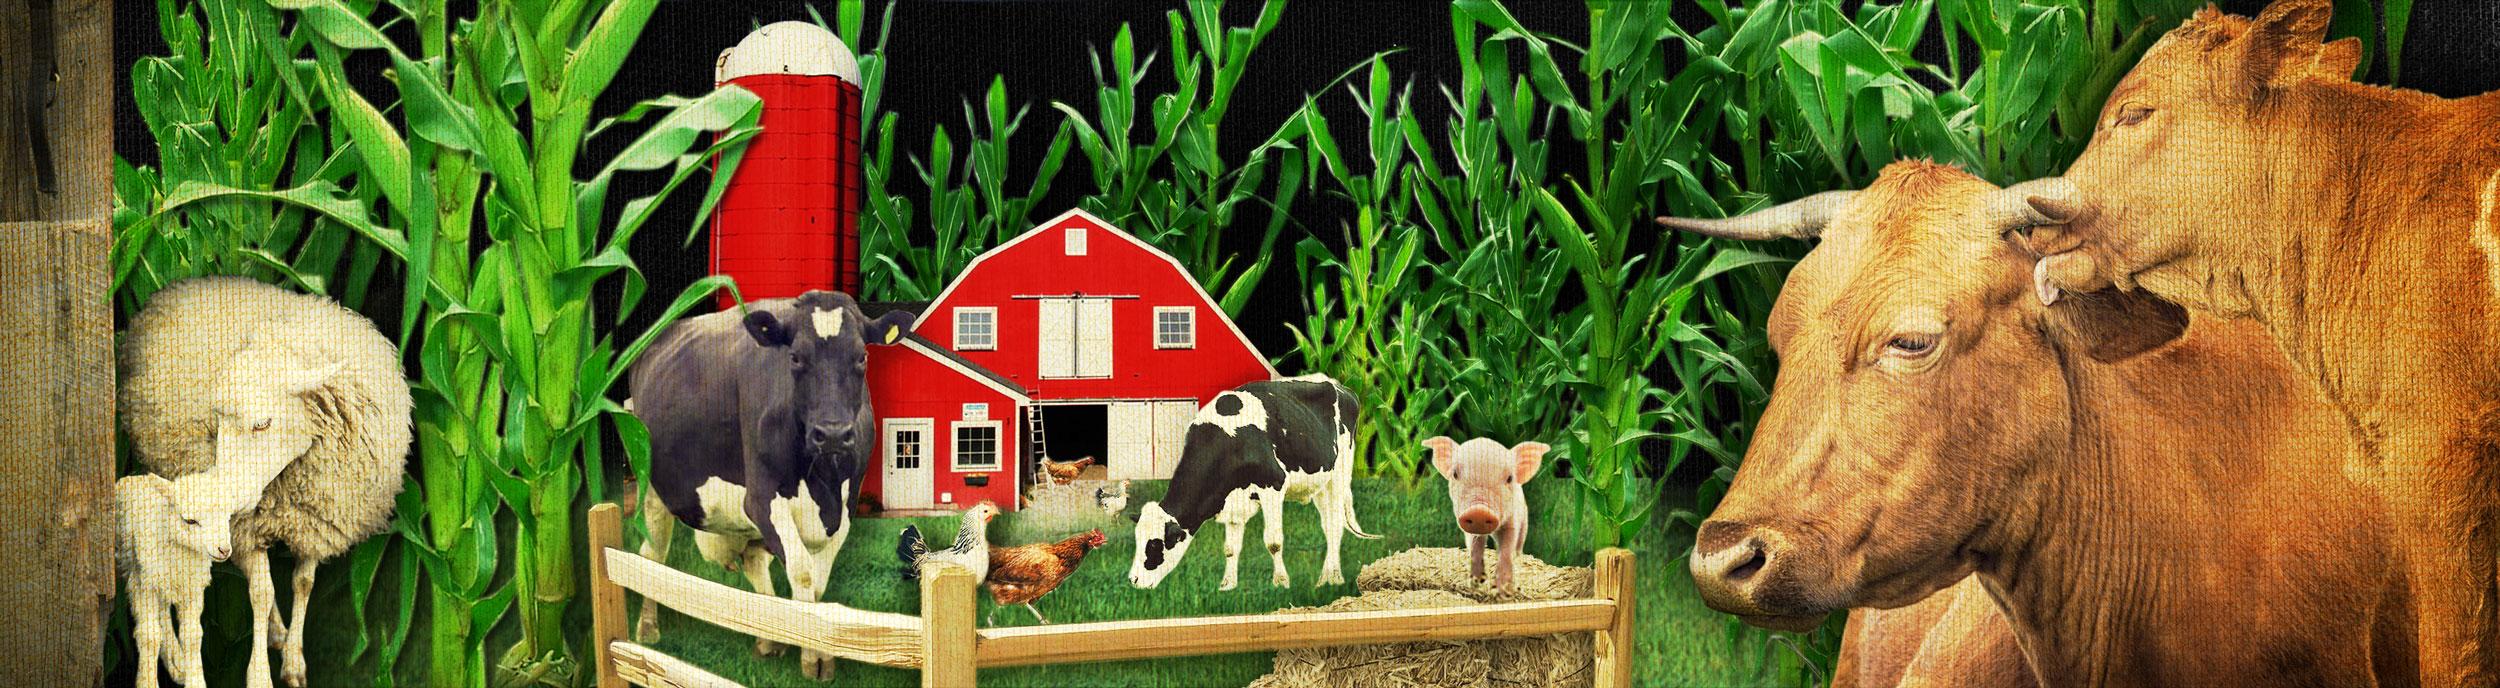 FarmSlideXXL